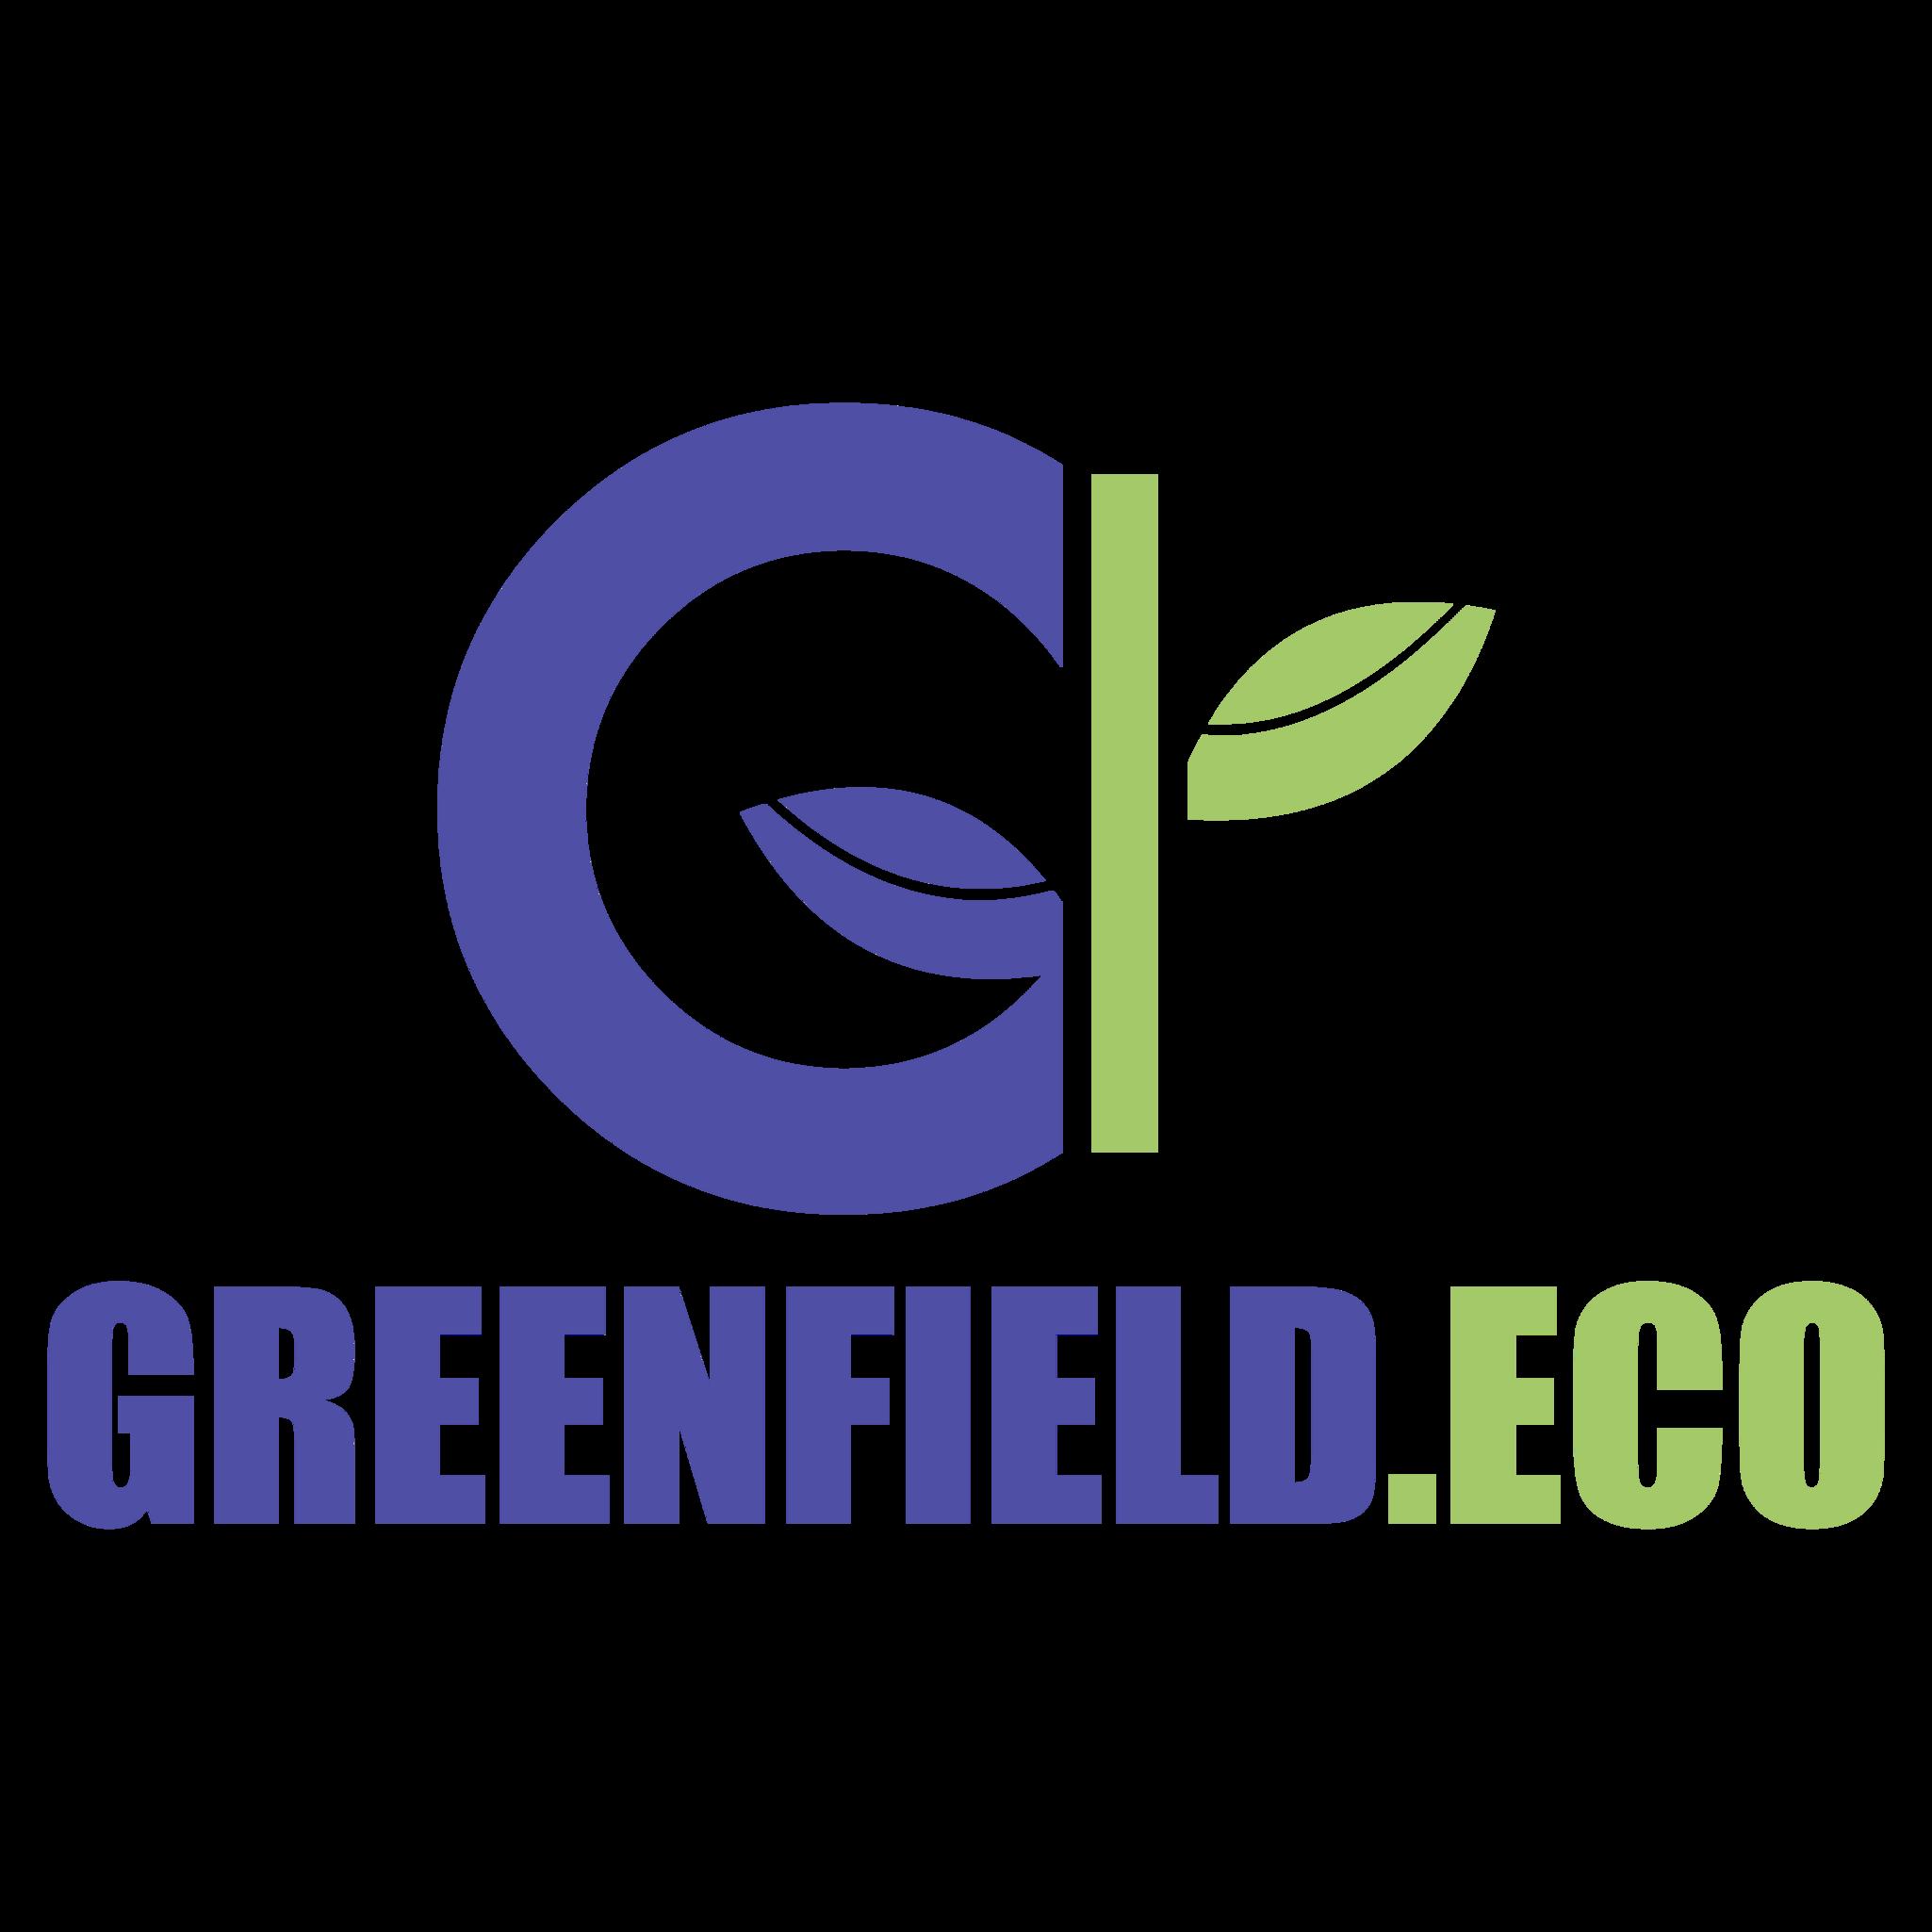 Company logo of Greenfield ECO